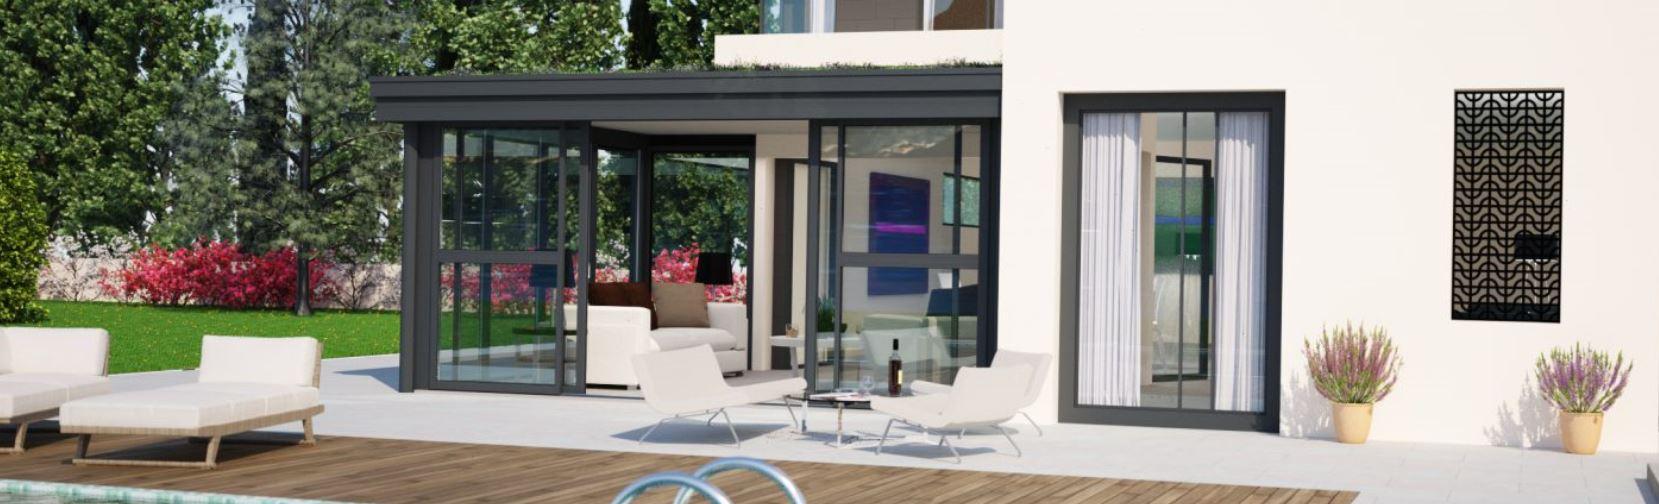 v randa toit plat toulouse colomiers. Black Bedroom Furniture Sets. Home Design Ideas